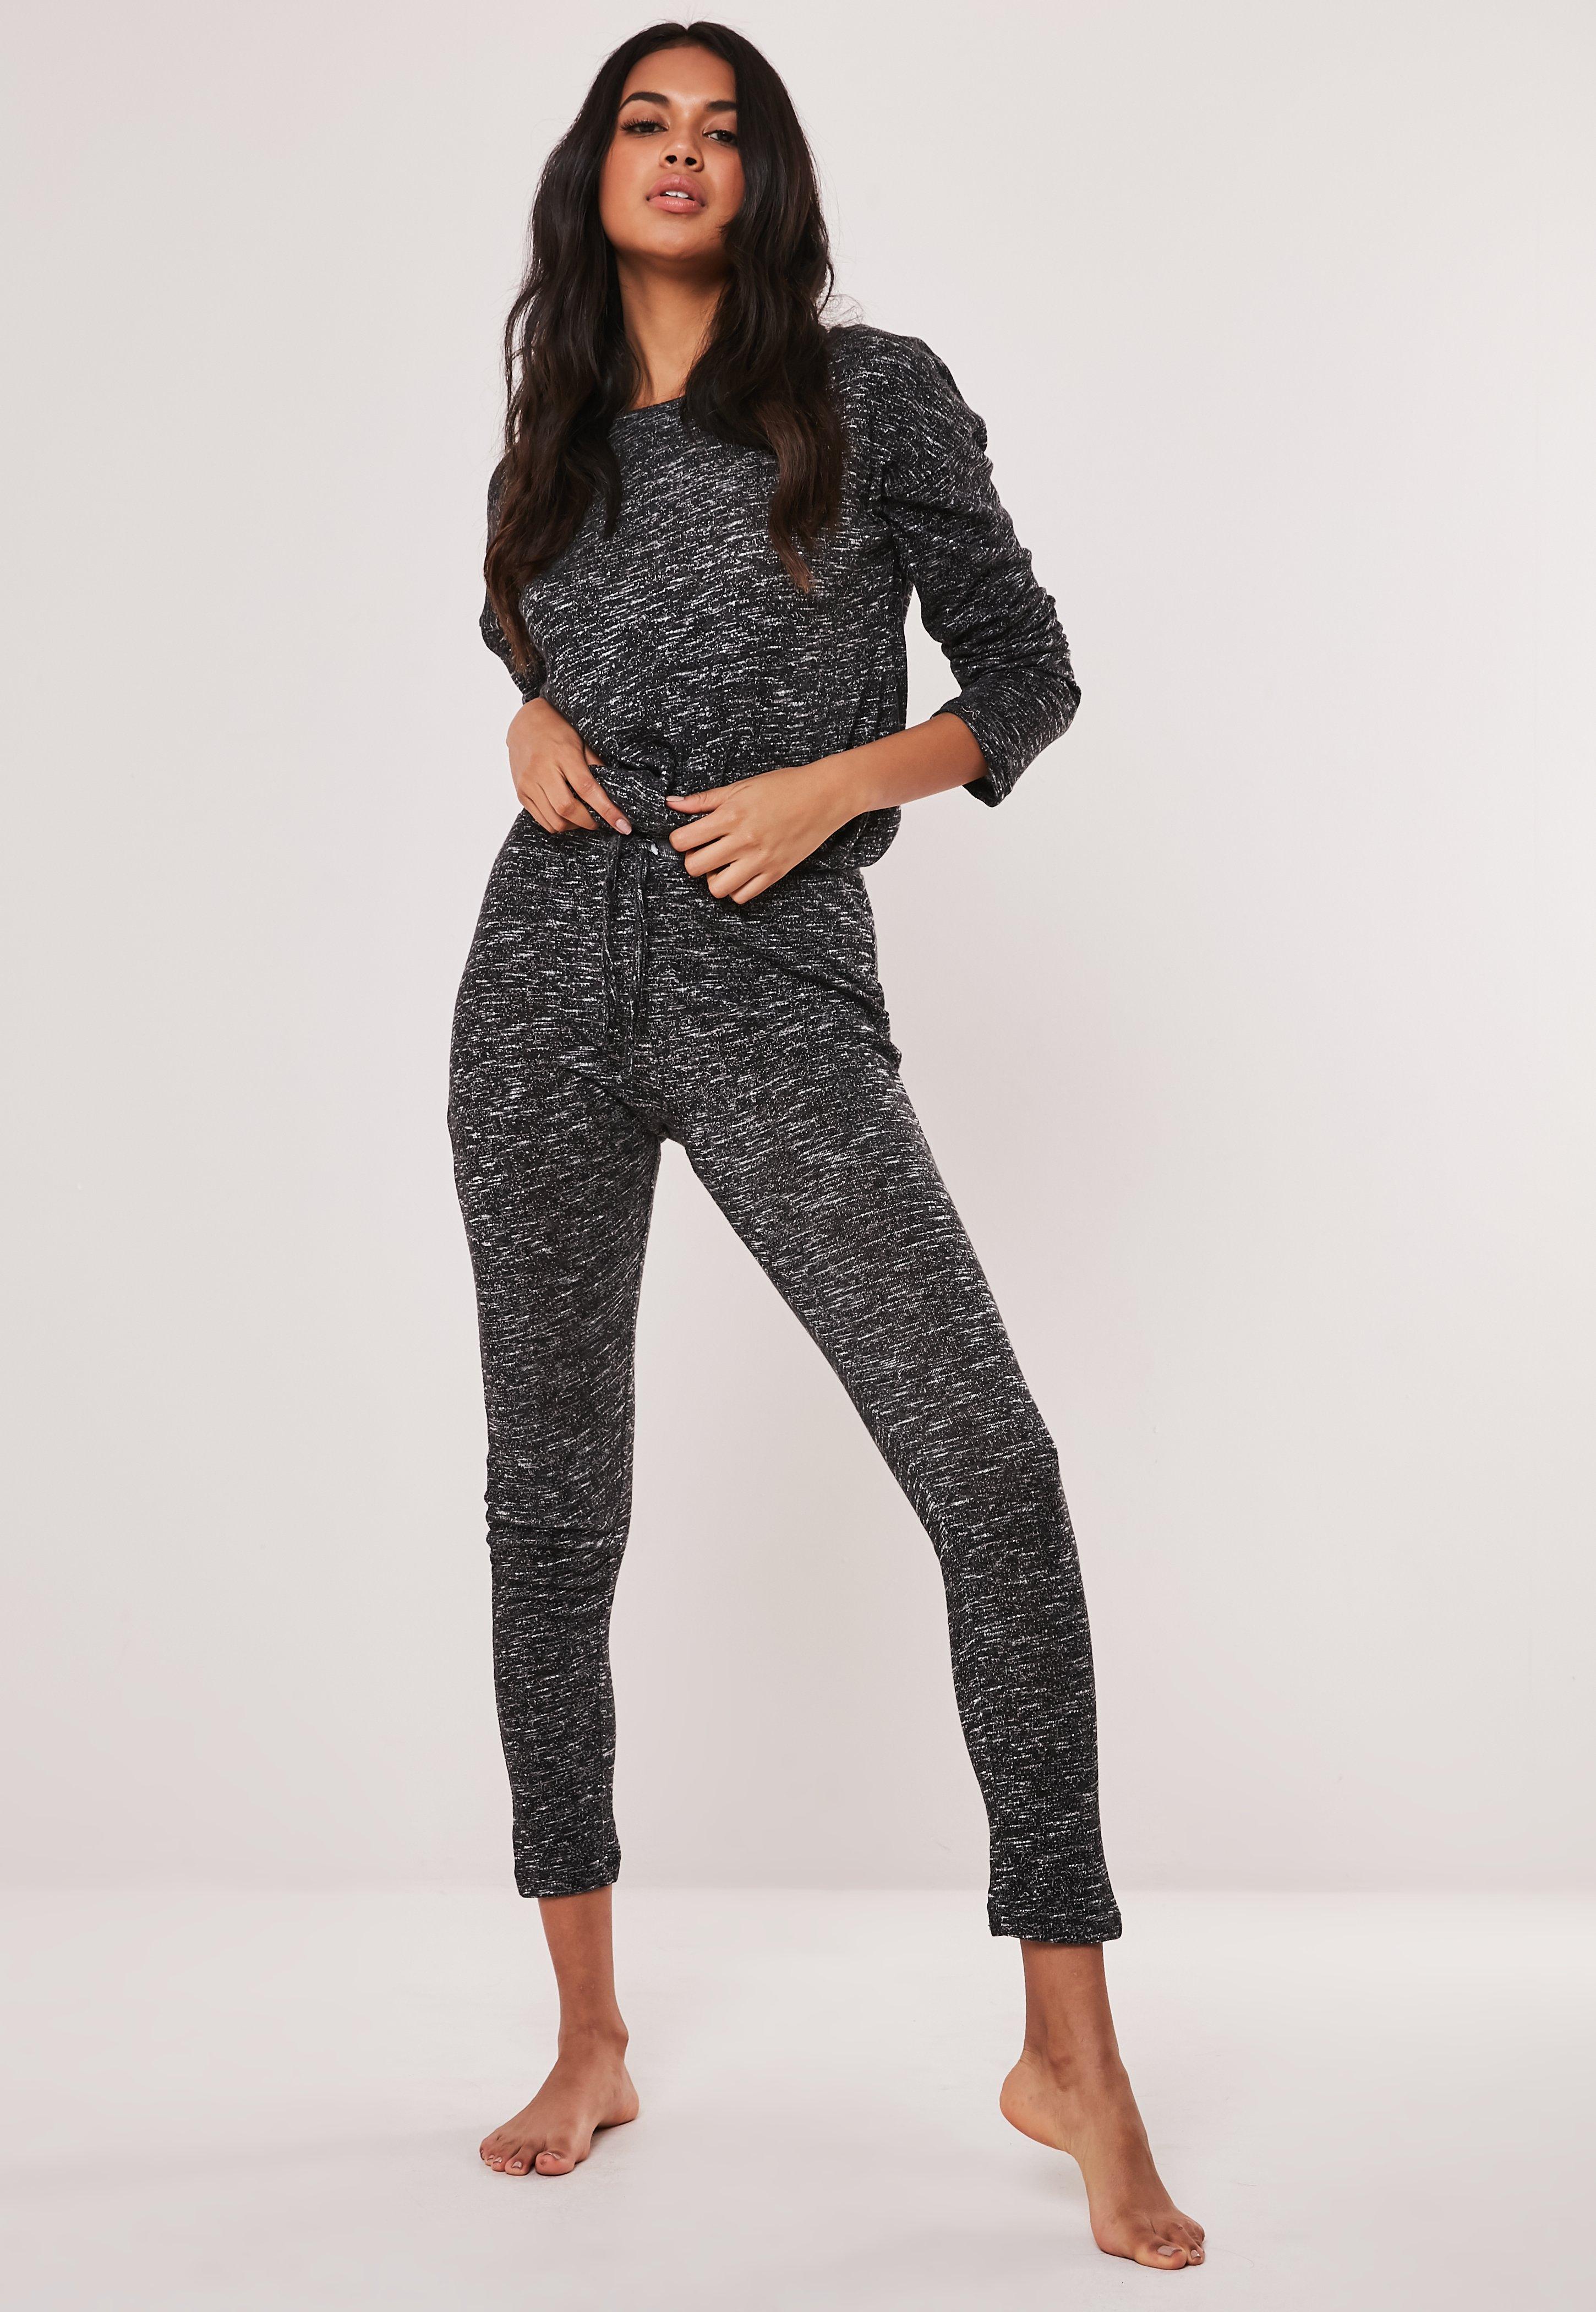 578db816 Black Soft Knit Long Sleeve Drawstring Loungewear Set